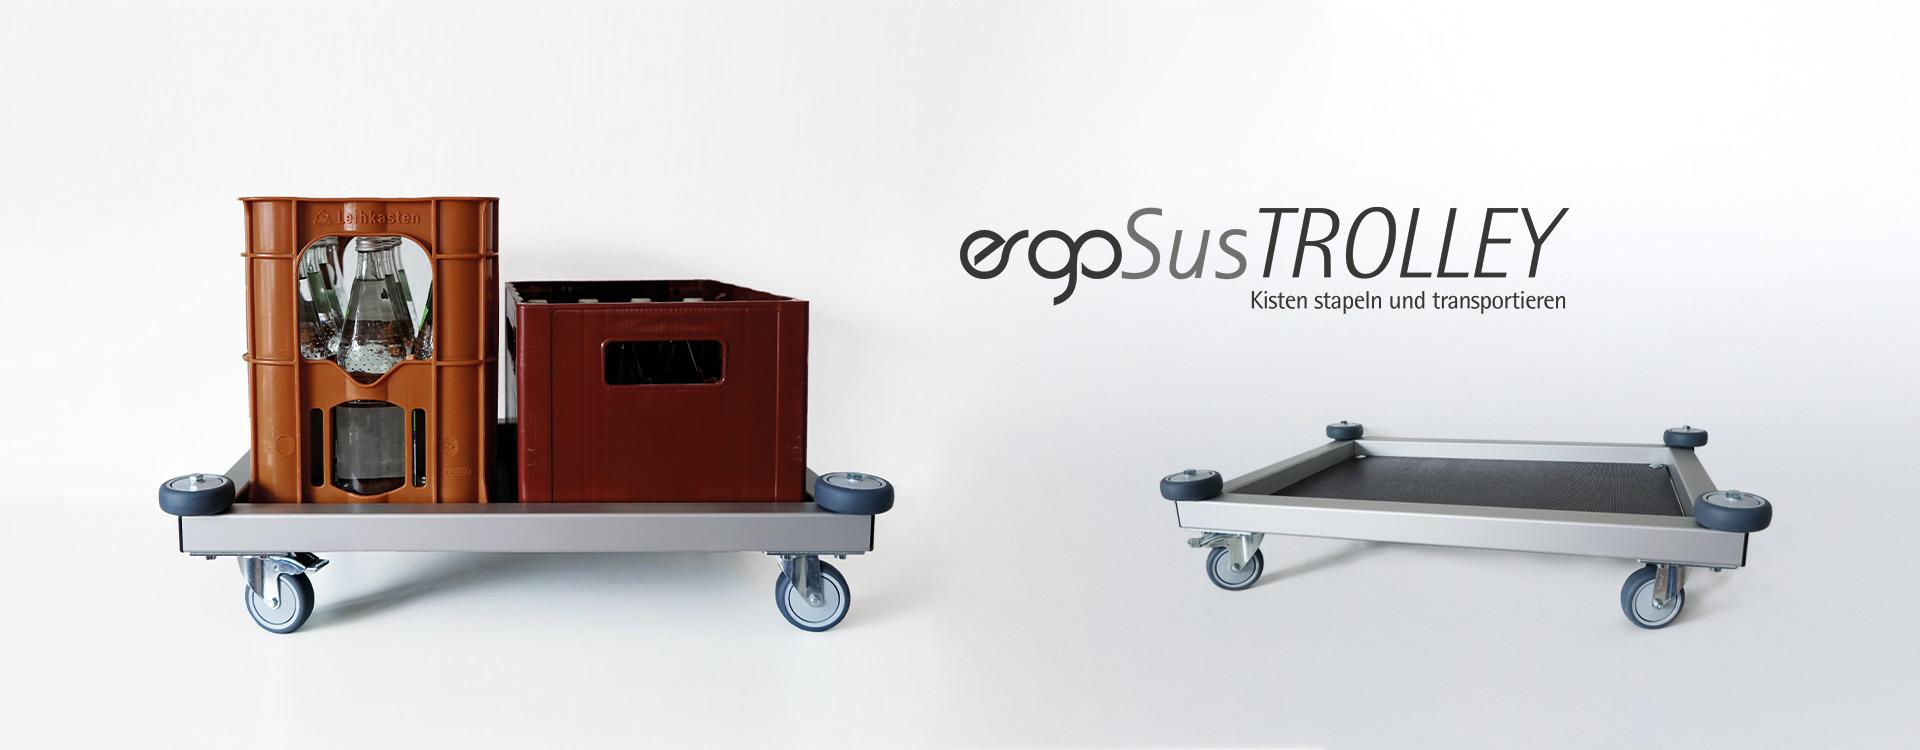 ErgoSus TROLLEY Kistentransport Wagen